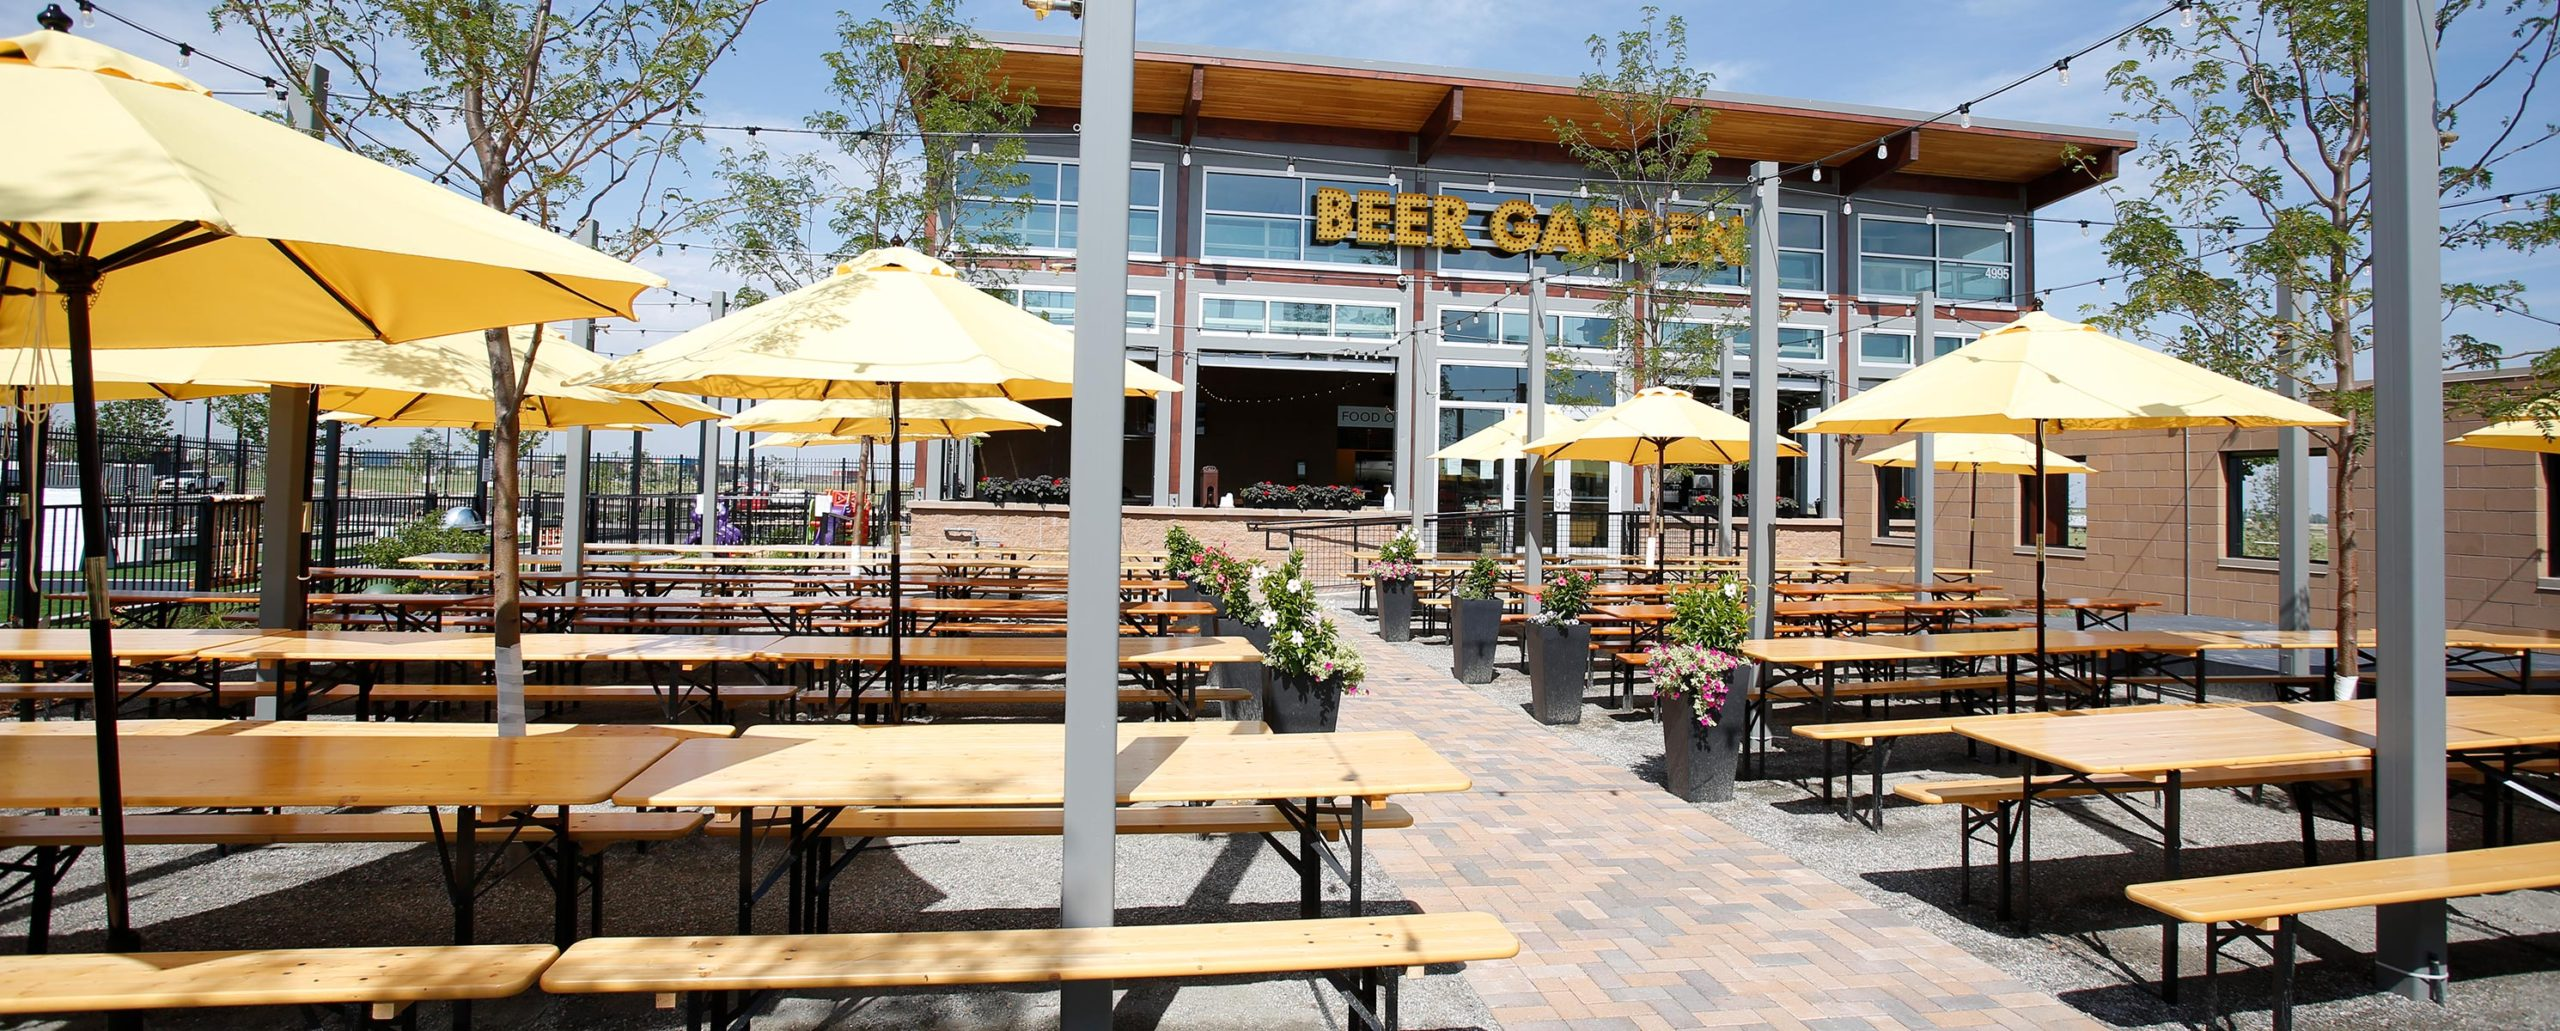 The GVR Beer Garden